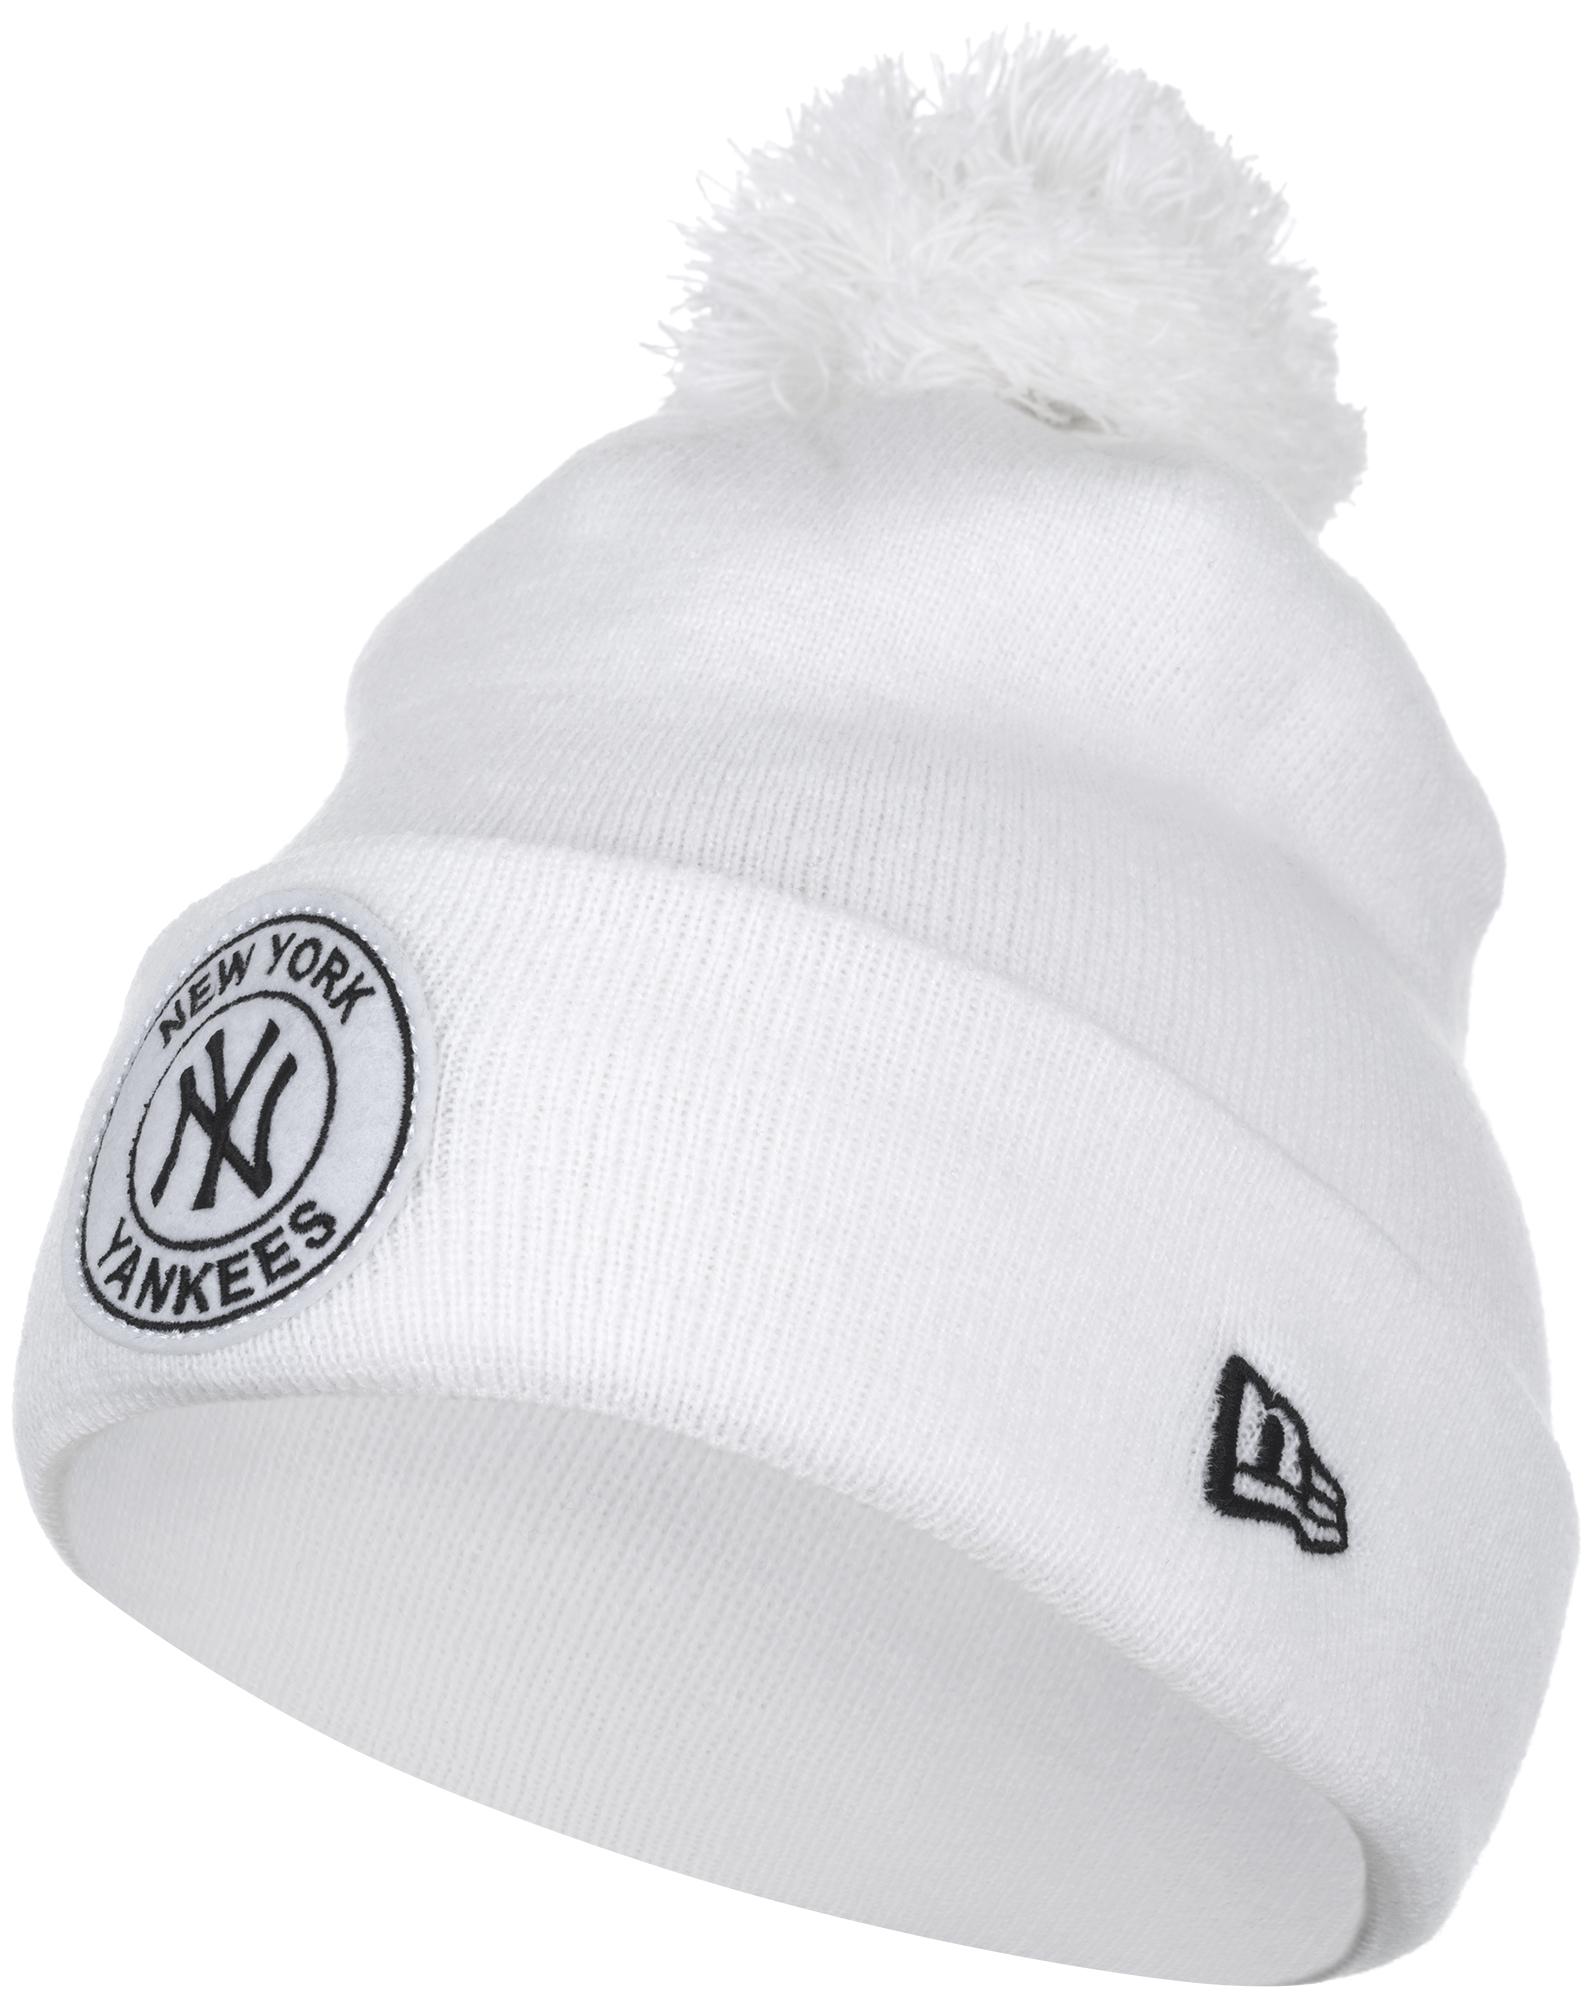 New Era Шапка New Era, размер Без размера new era шапка для мальчиков new era 841 tonal character